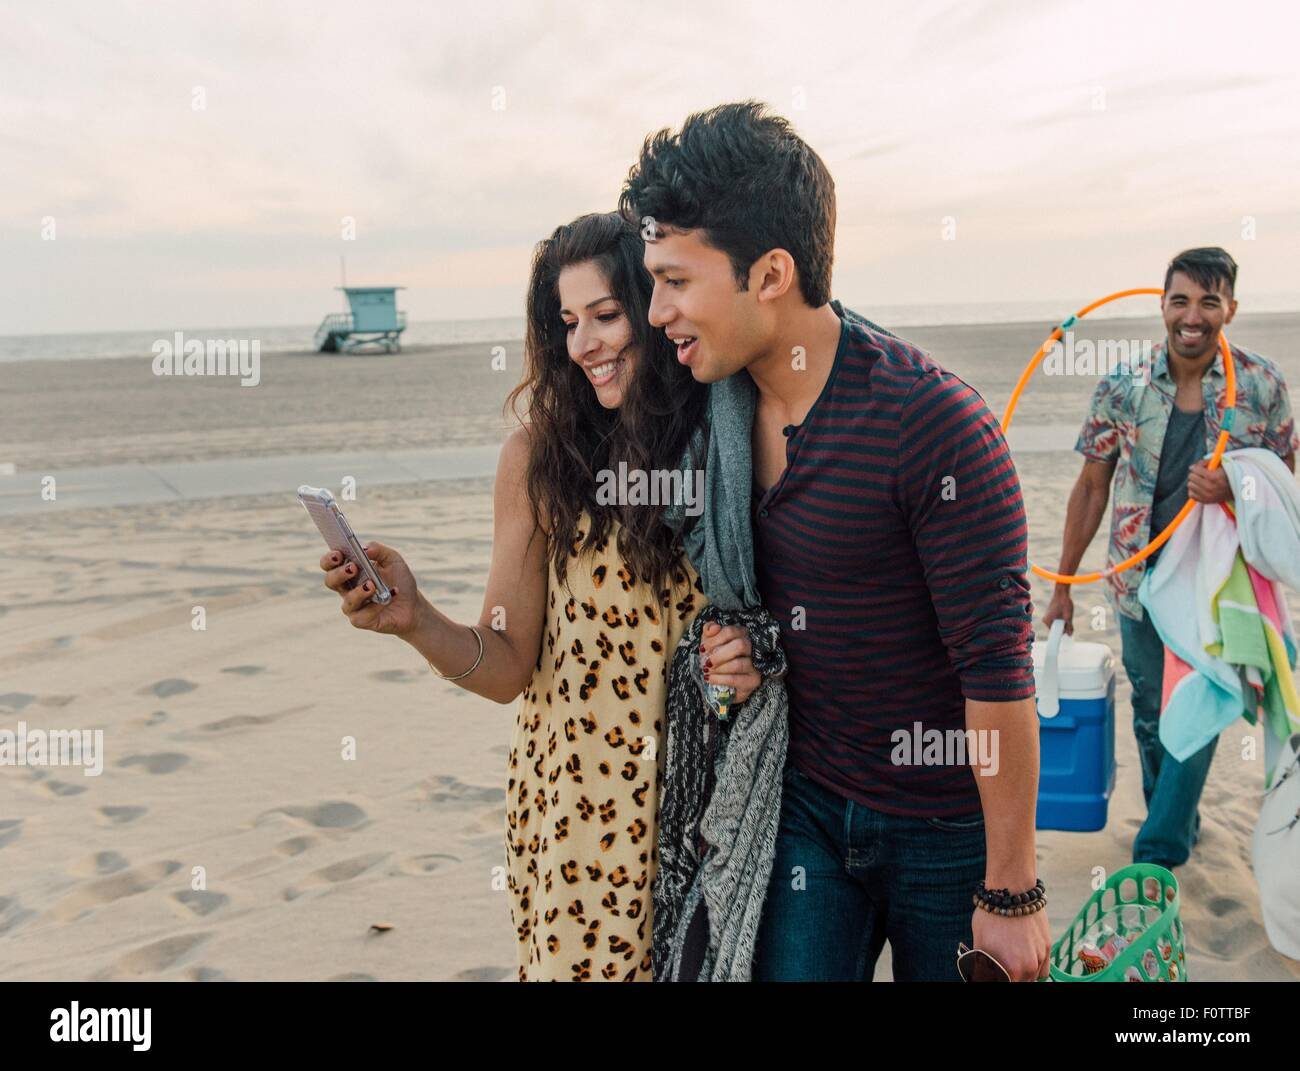 Groupe d'amis à marcher le long beach, young couple looking at smartphone Banque D'Images